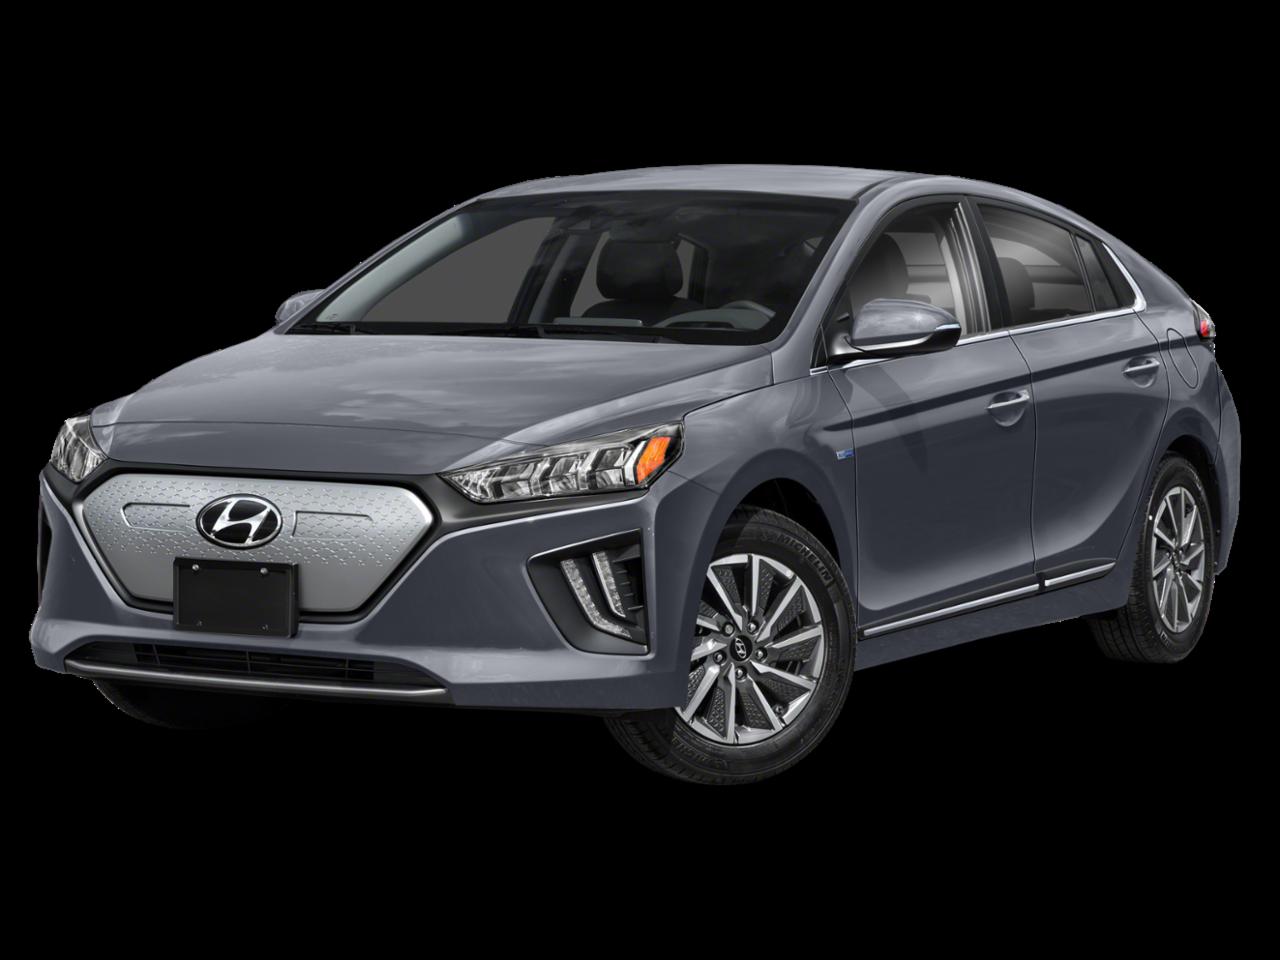 Hyundai 2020 IONIQ Electric Limited